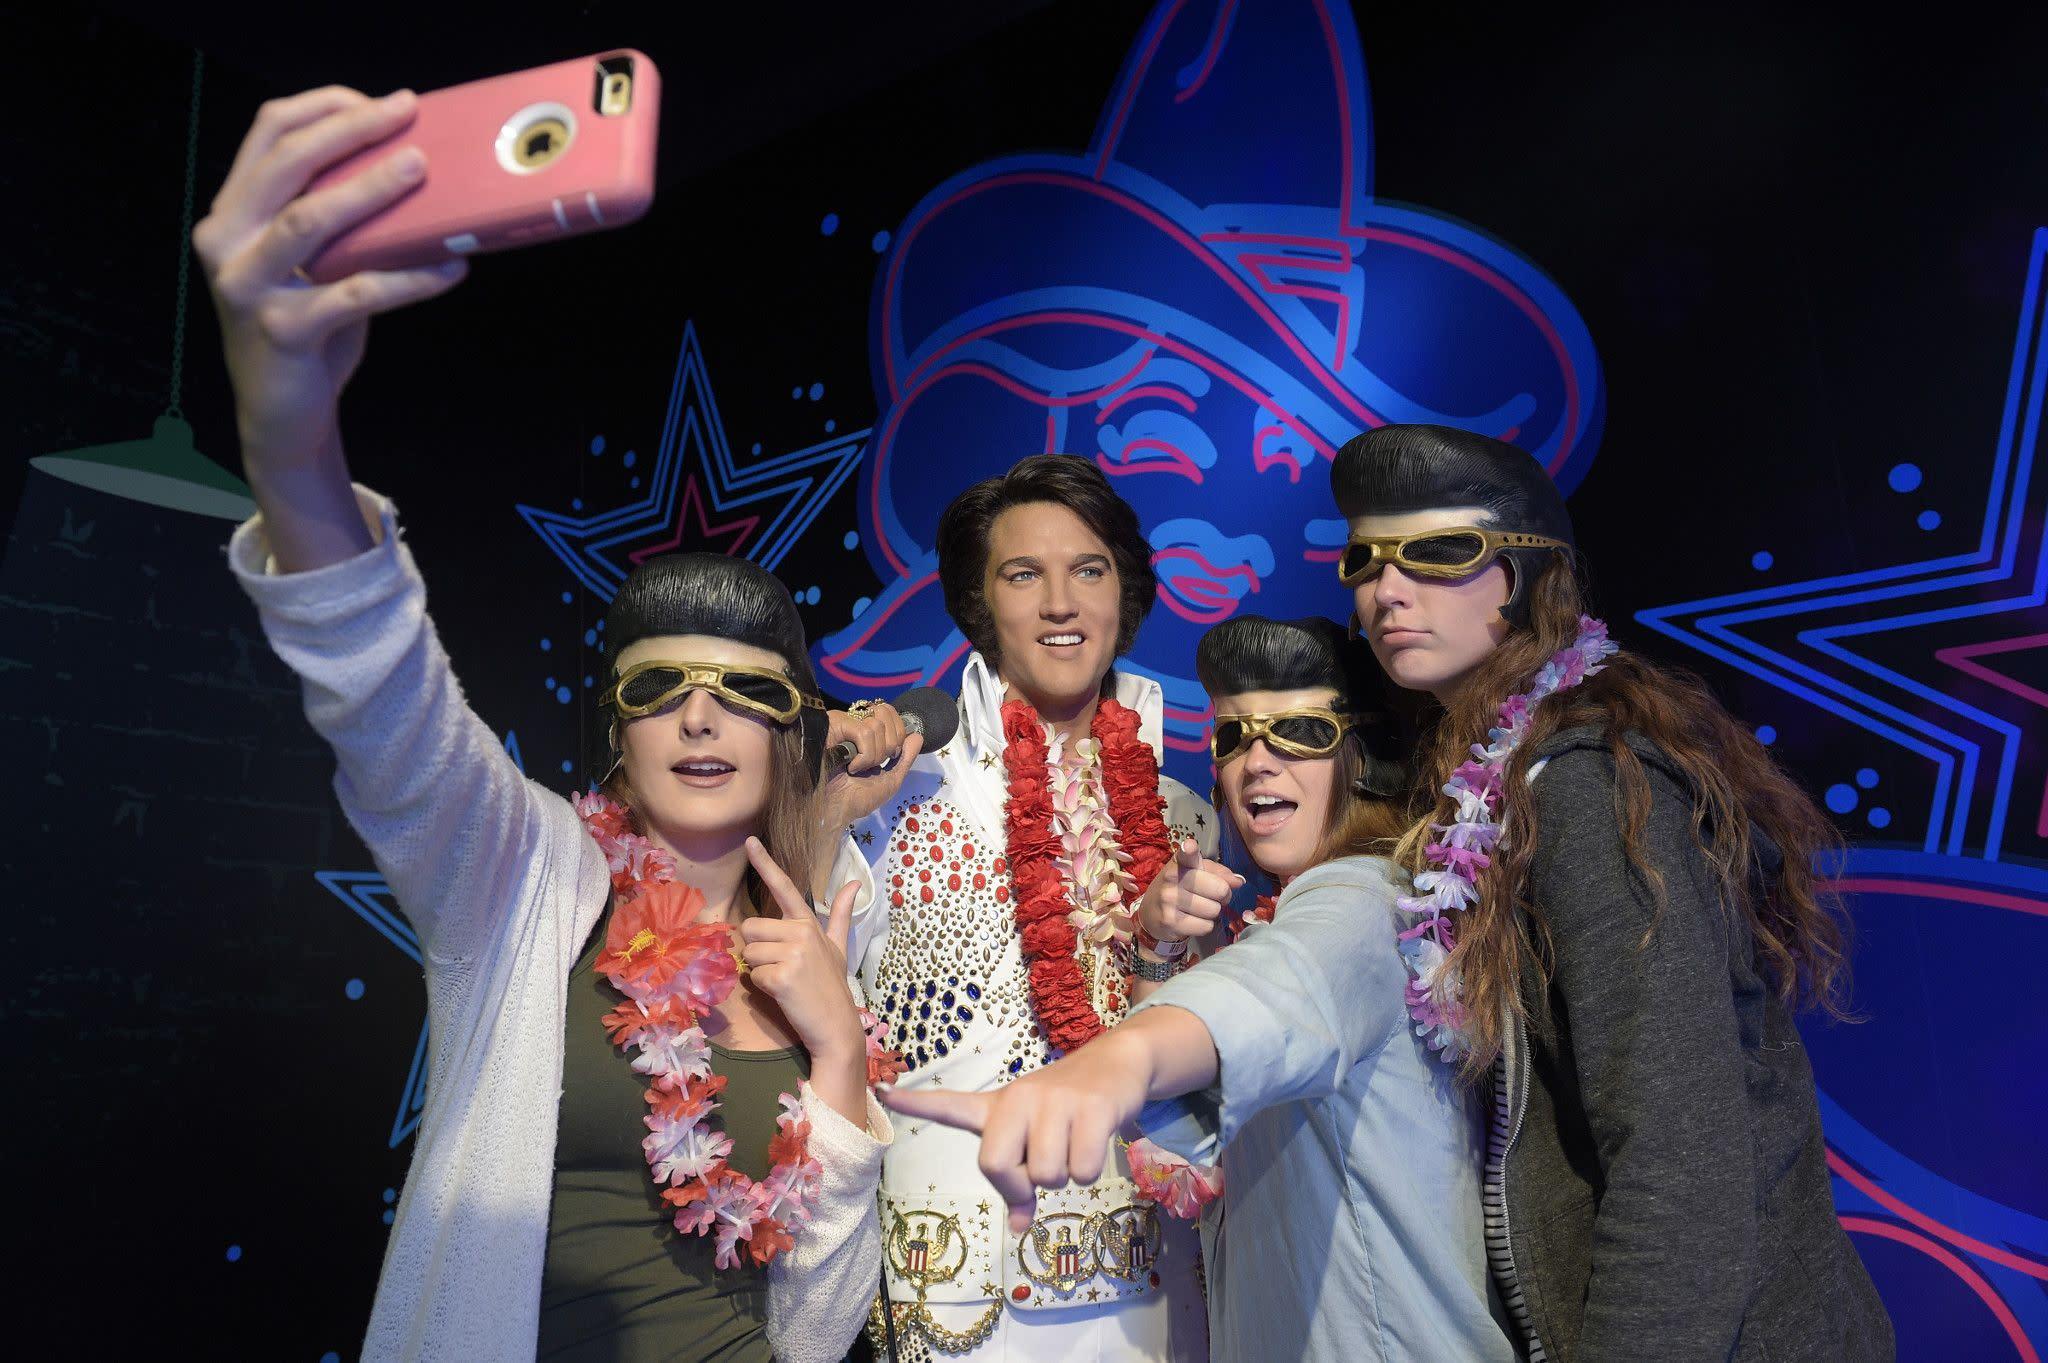 Elvis at Madame Tussauds Orlando